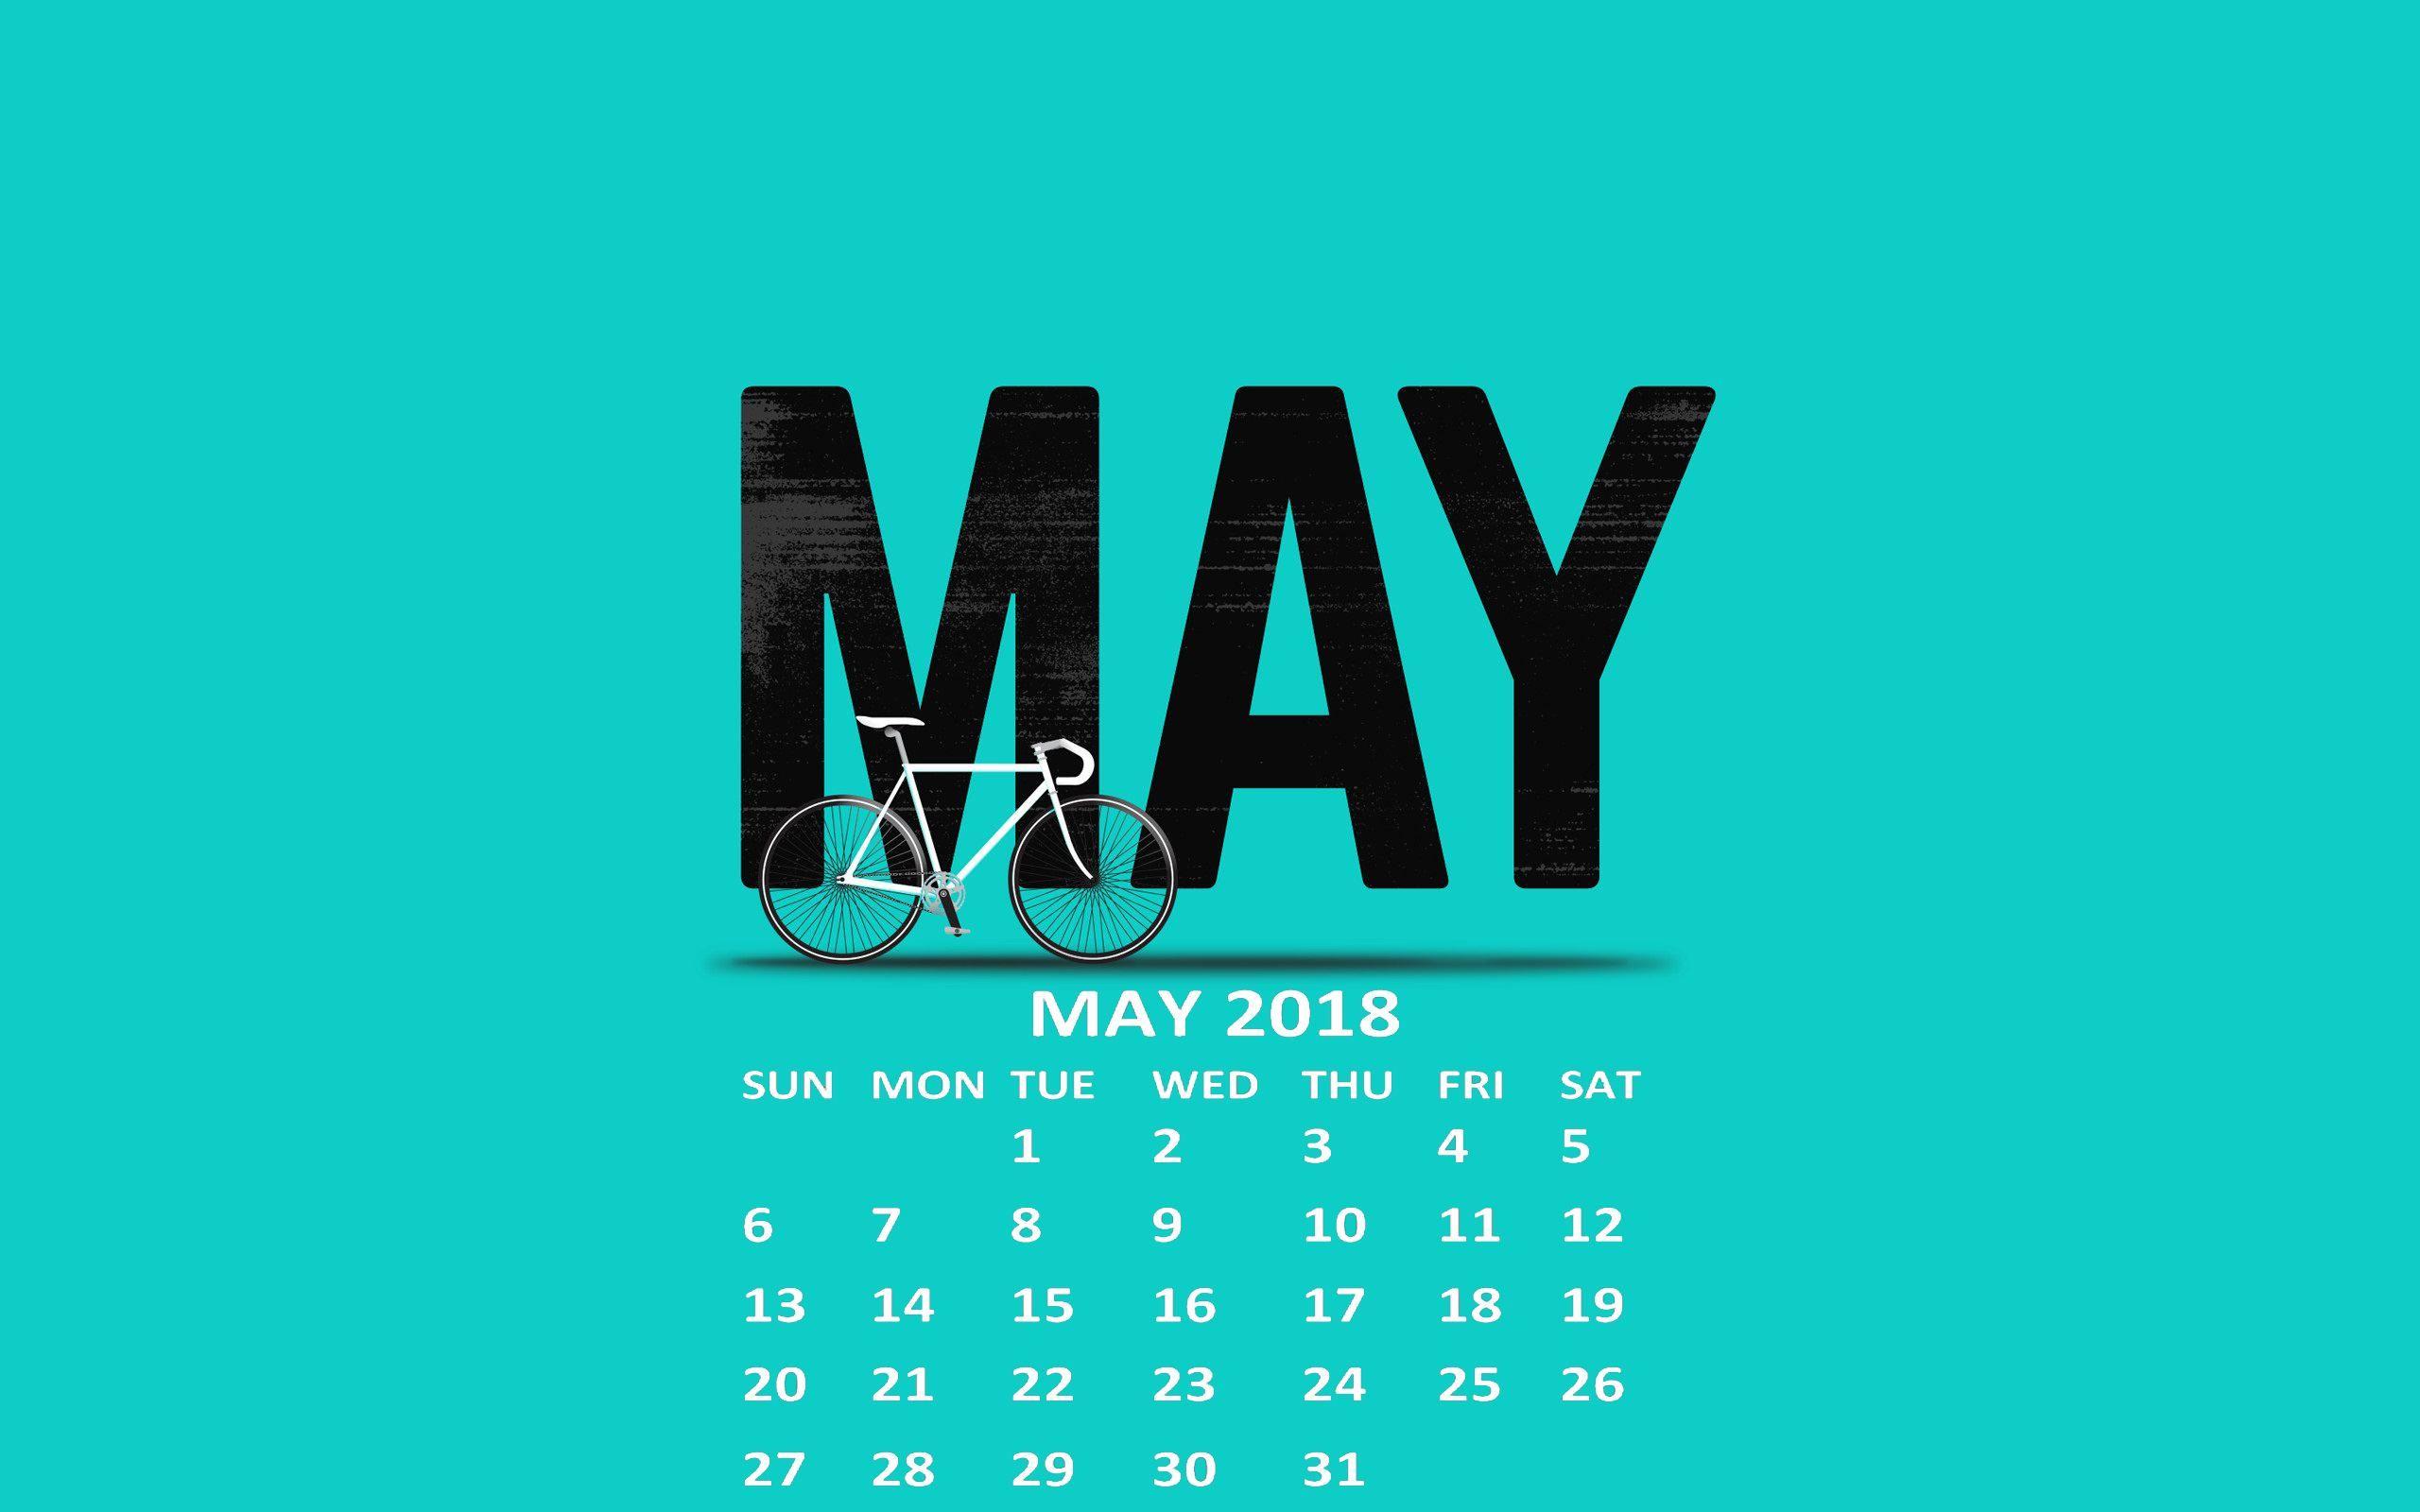 May 2018 Calendar Wallpapers